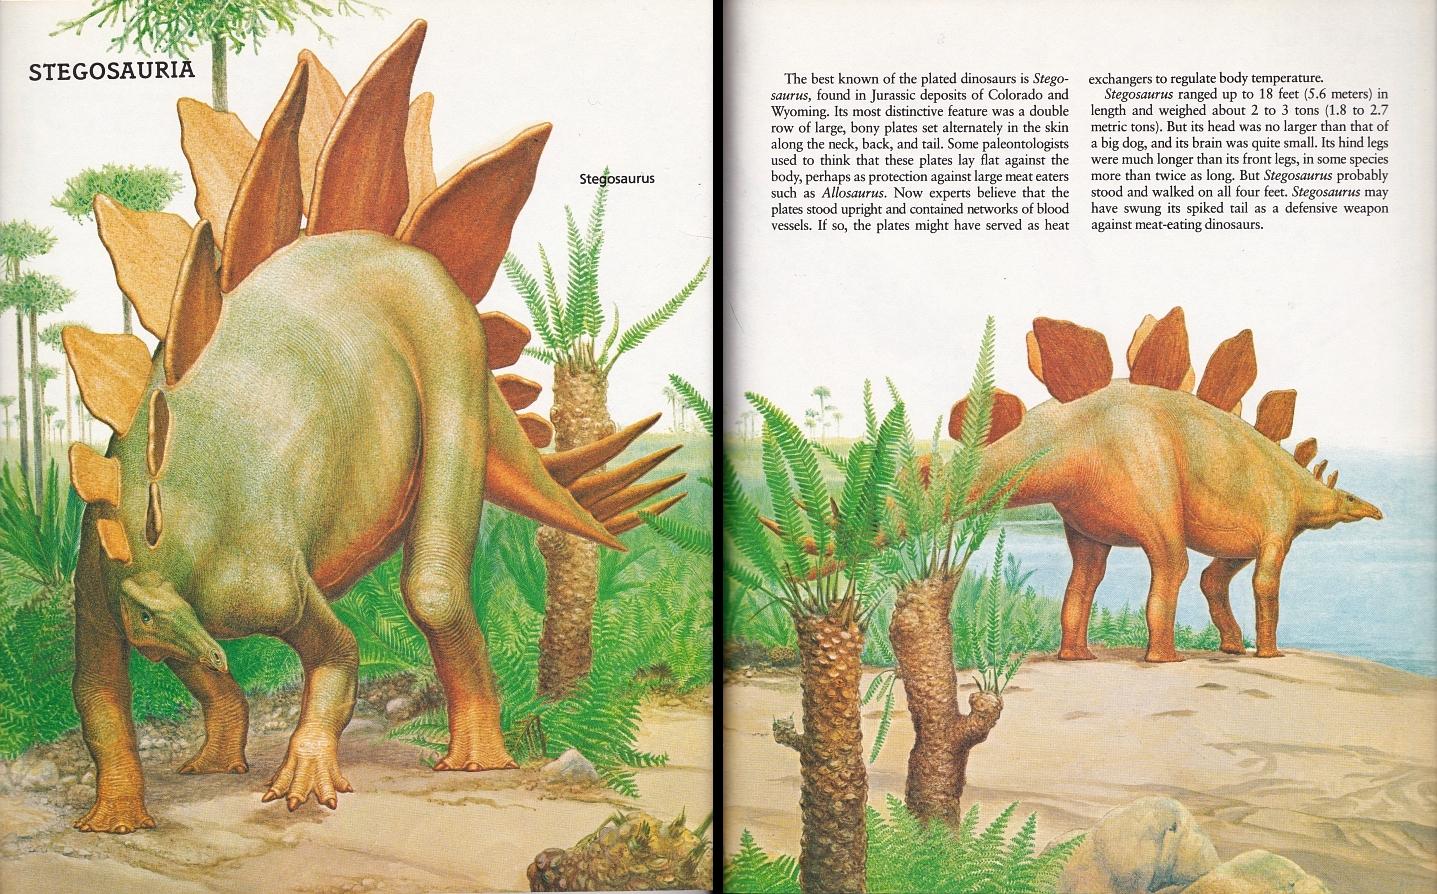 Stegosaurus by Peter Zallinger